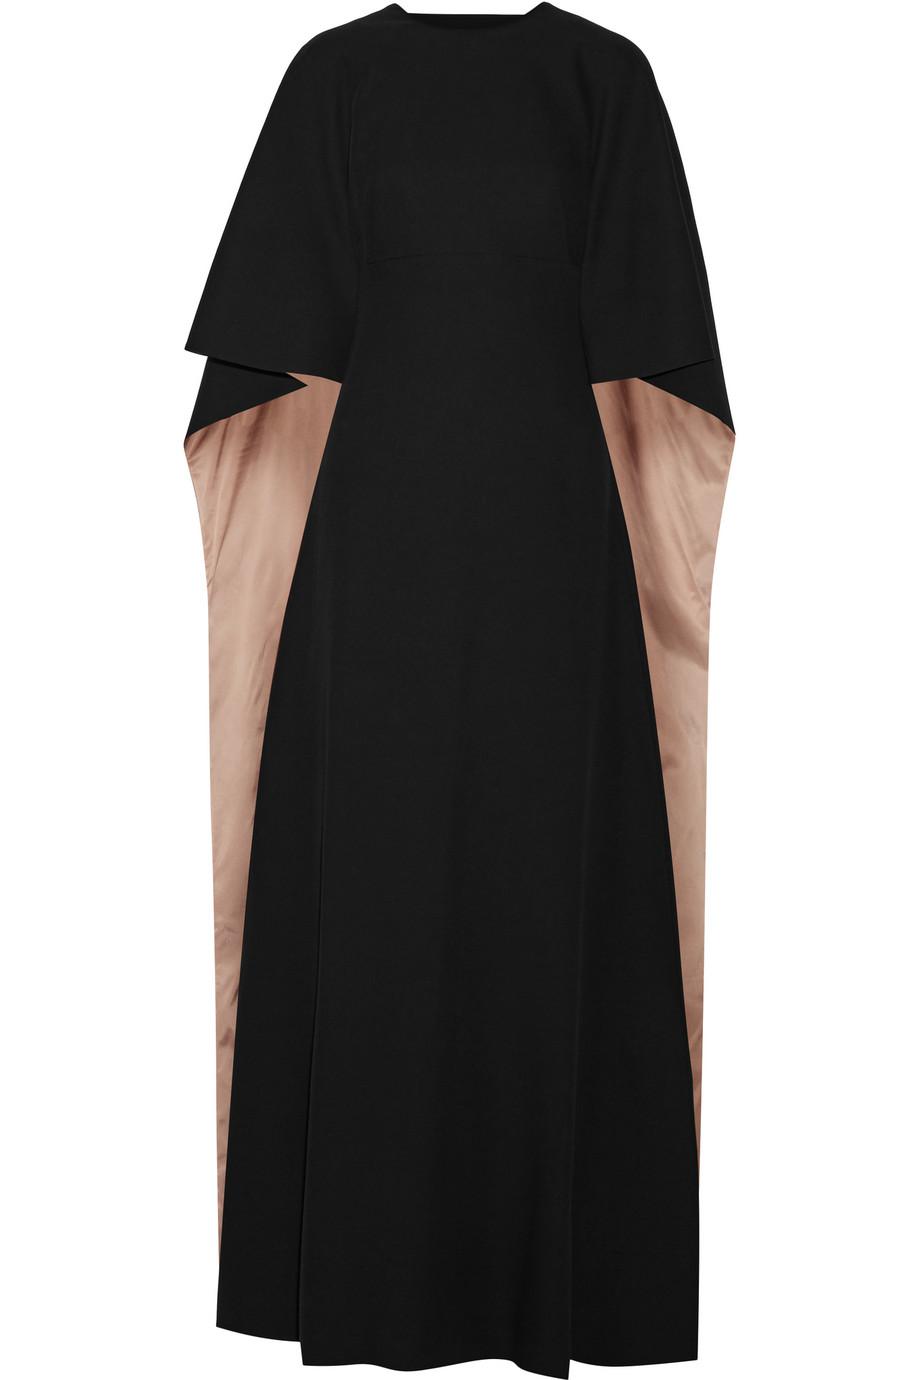 Valentino Cape-Back Silk-Cady Gown, Black, Women's, Size: 38